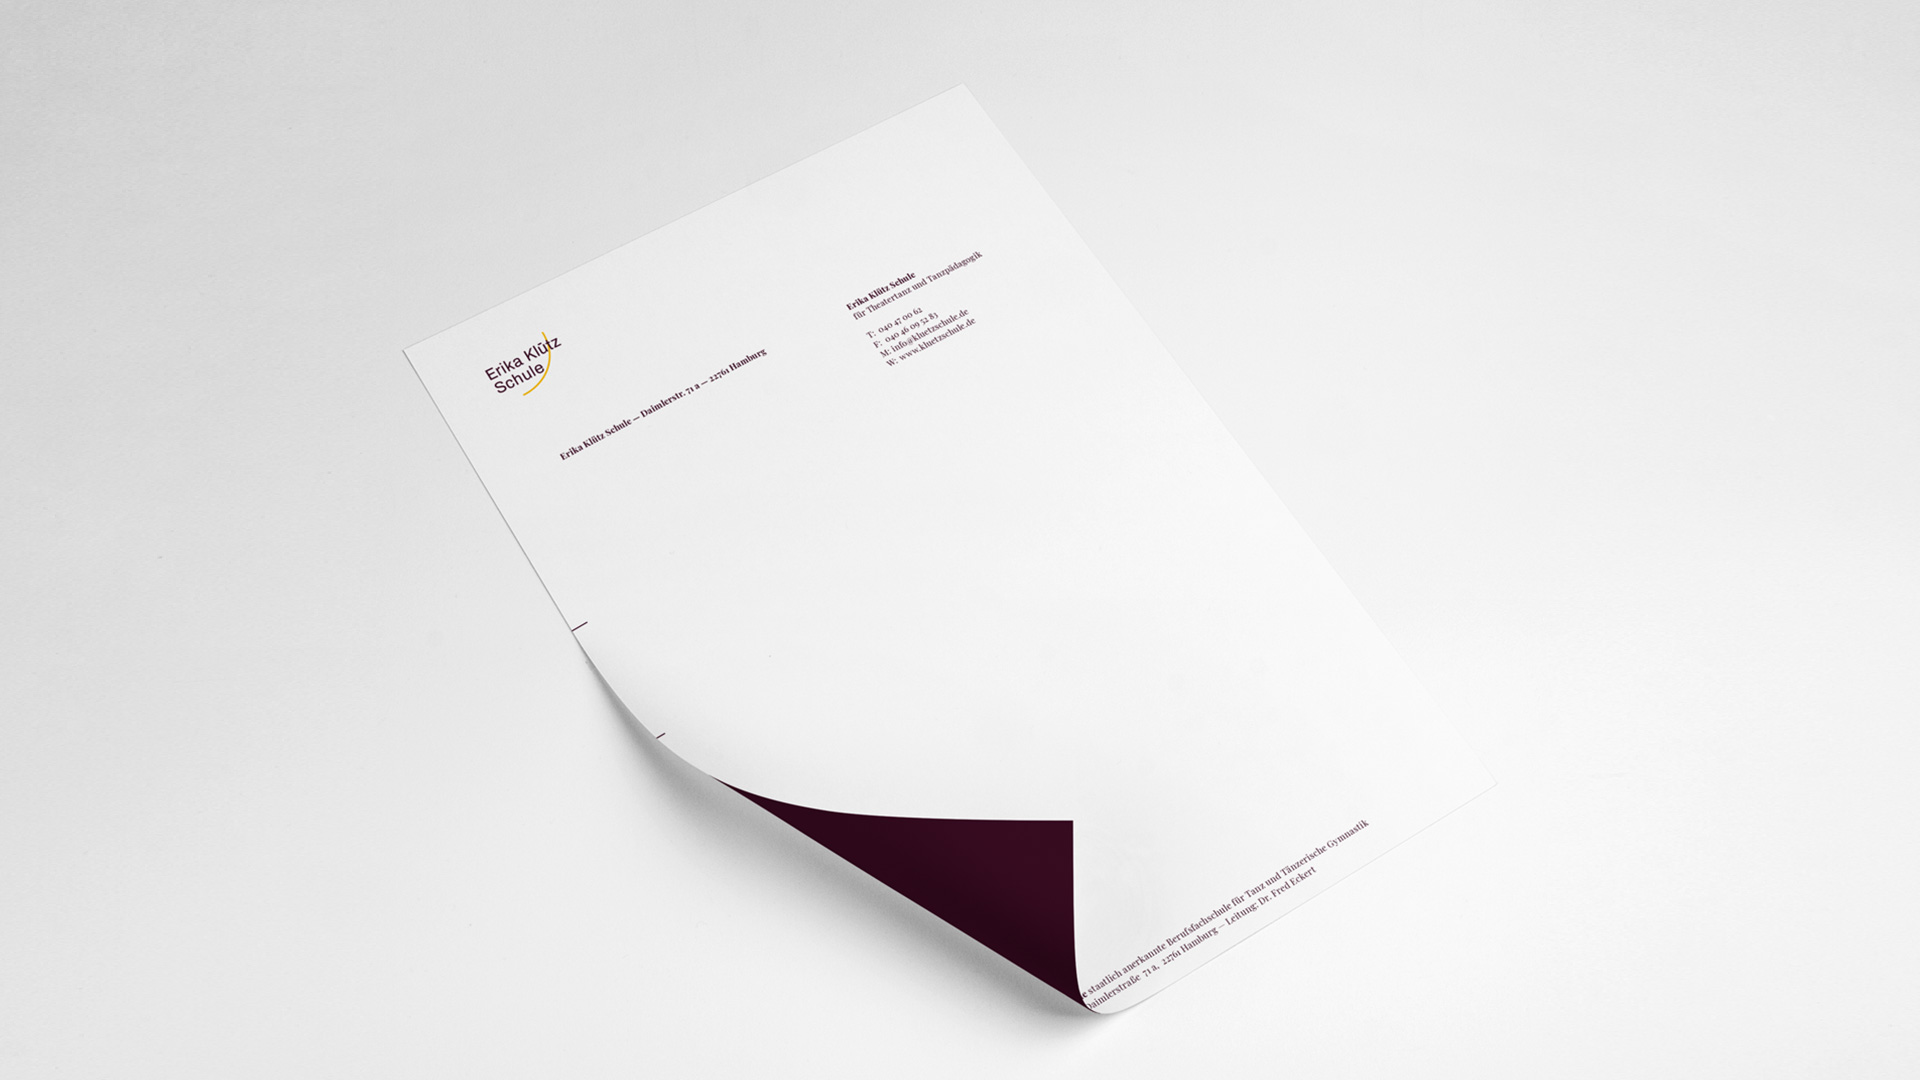 Erika-Kluetz-Schule-Briefpapier-02-MOCK